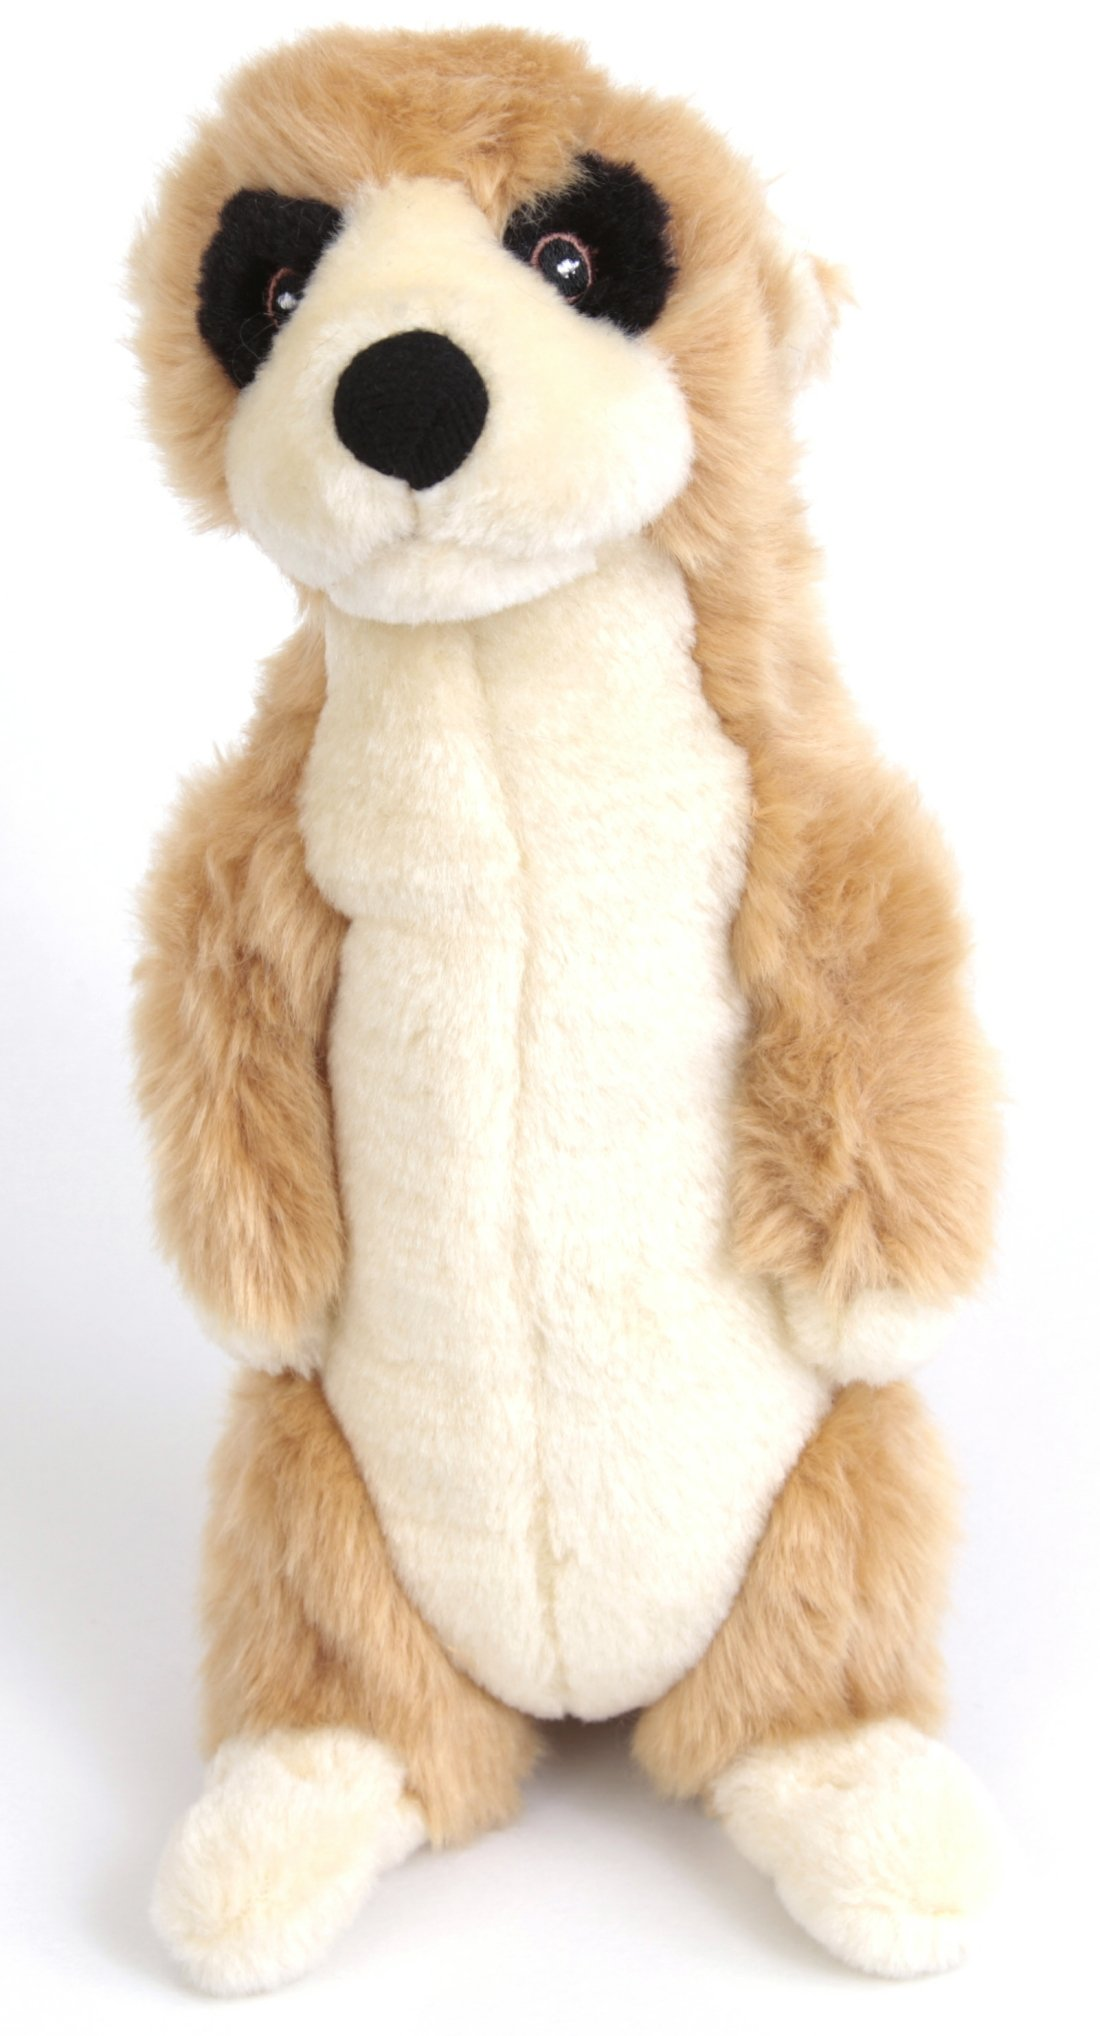 Animate-Soft-Plush-Meerkat-Dog-Toy-11-inch